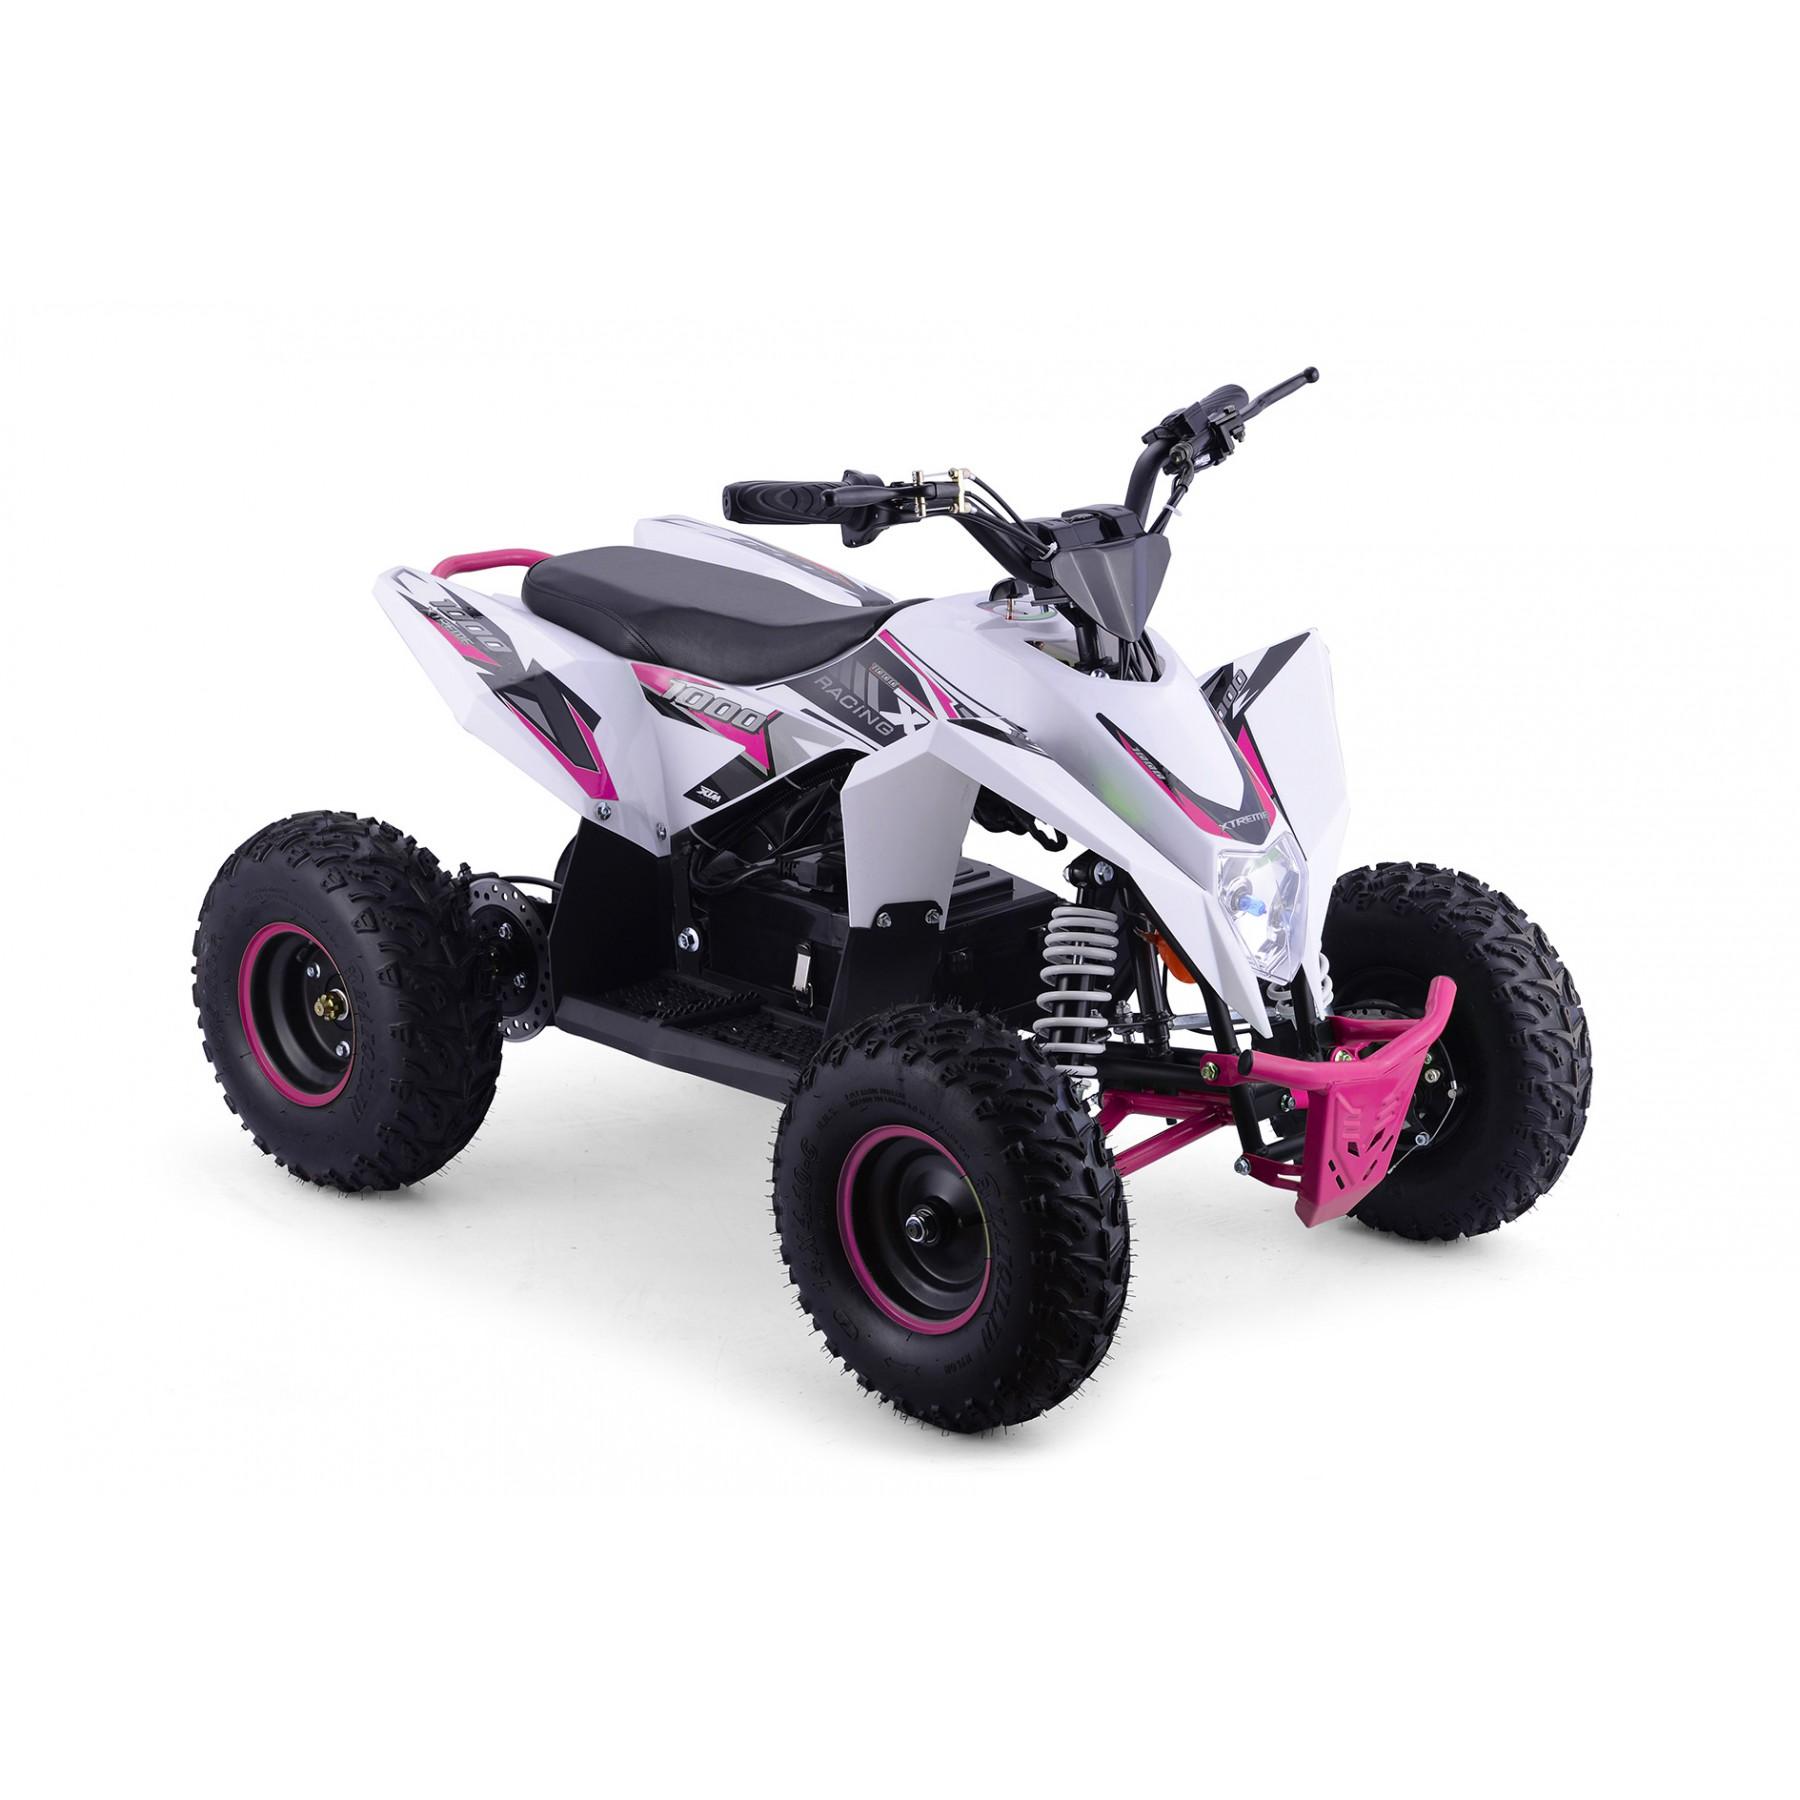 XTM RACING 1000w QUAD BIKE WHITE PINK